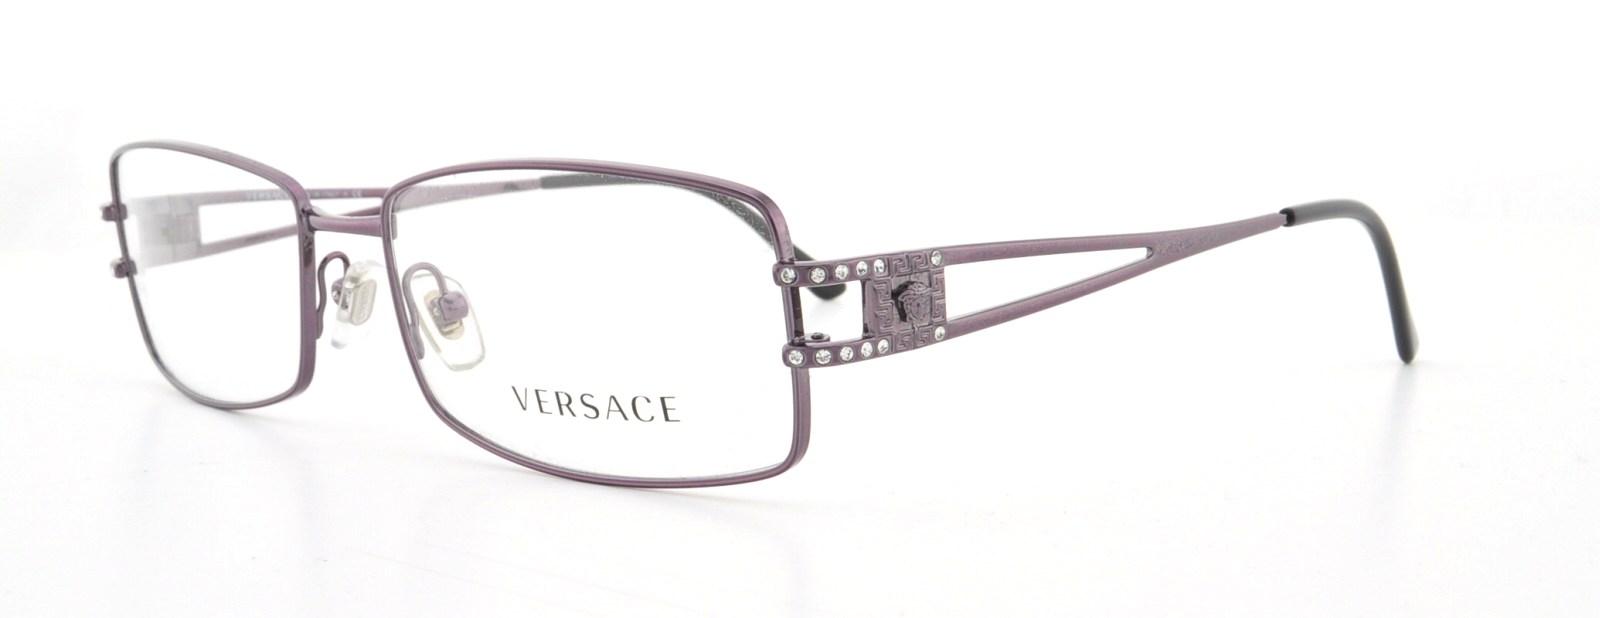 a3782e62b83 Versace Eyeglass Frames Warranty - Bitterroot Public Library